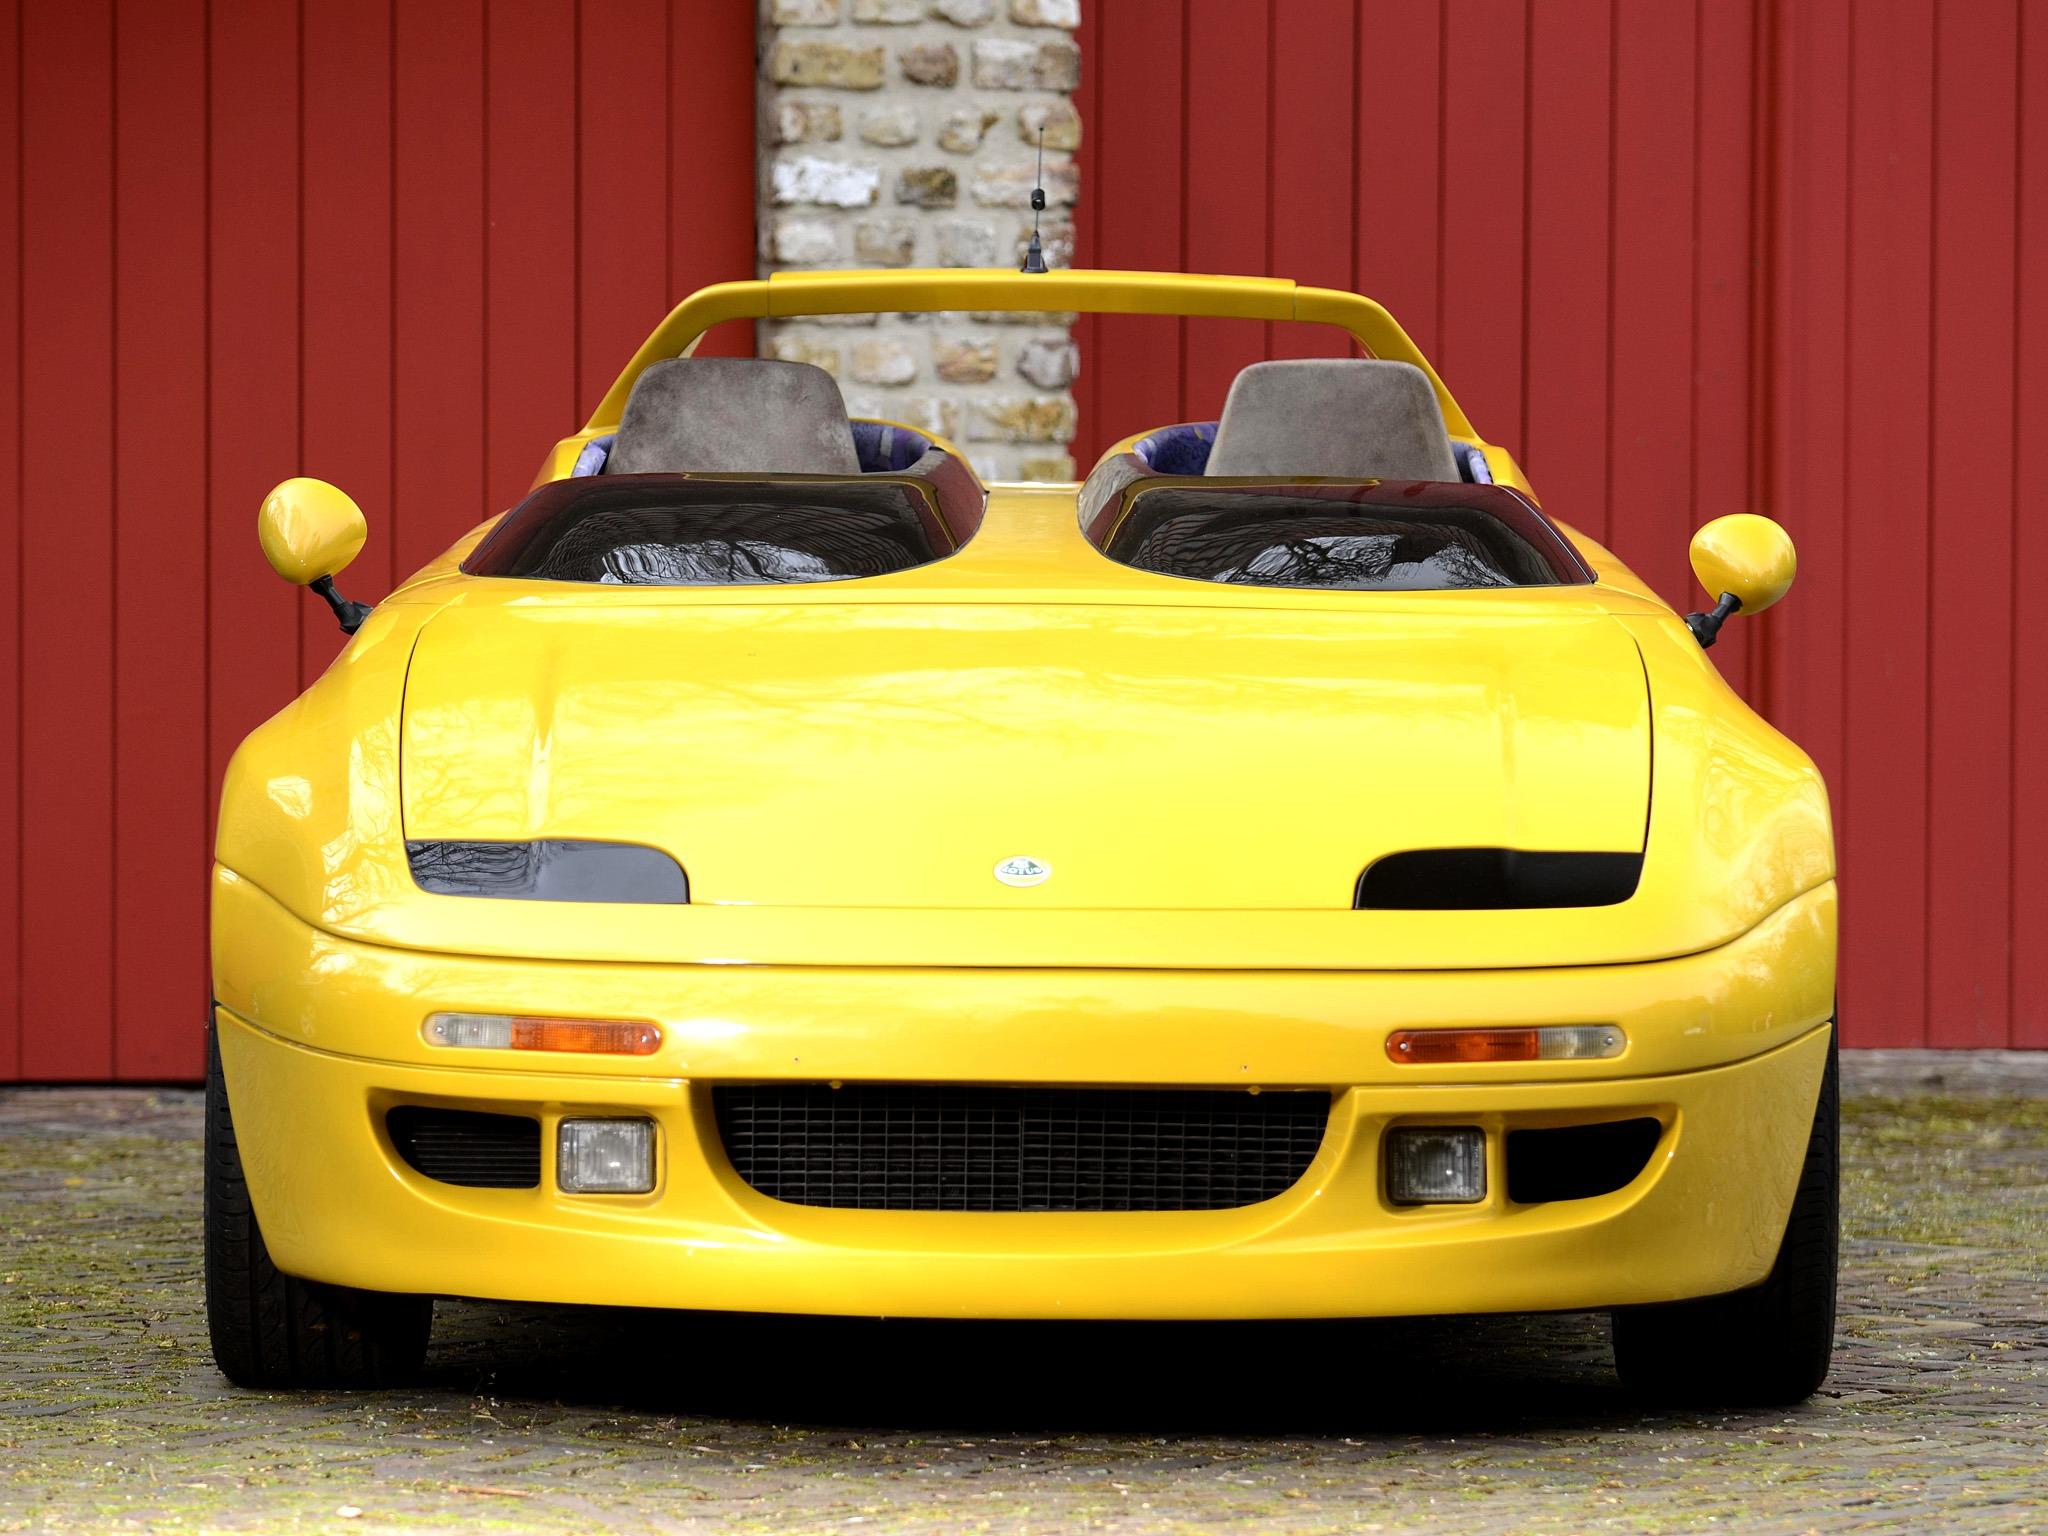 lotus m200 concept (1991) – old concept cars